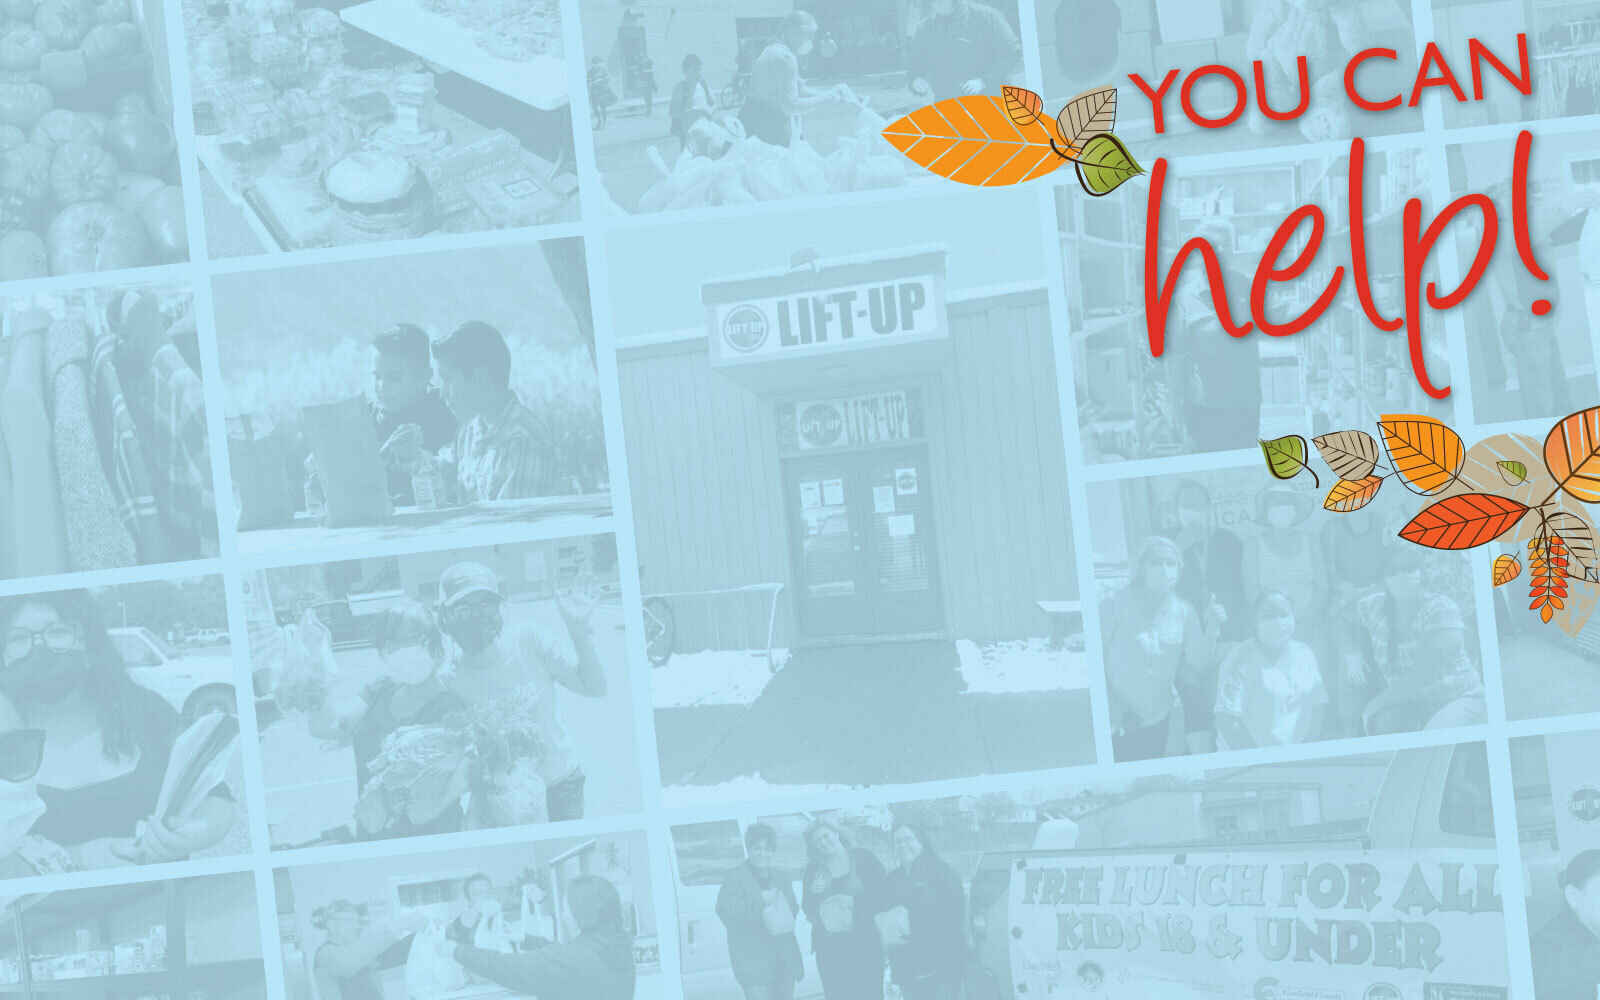 Uplifting community through food image